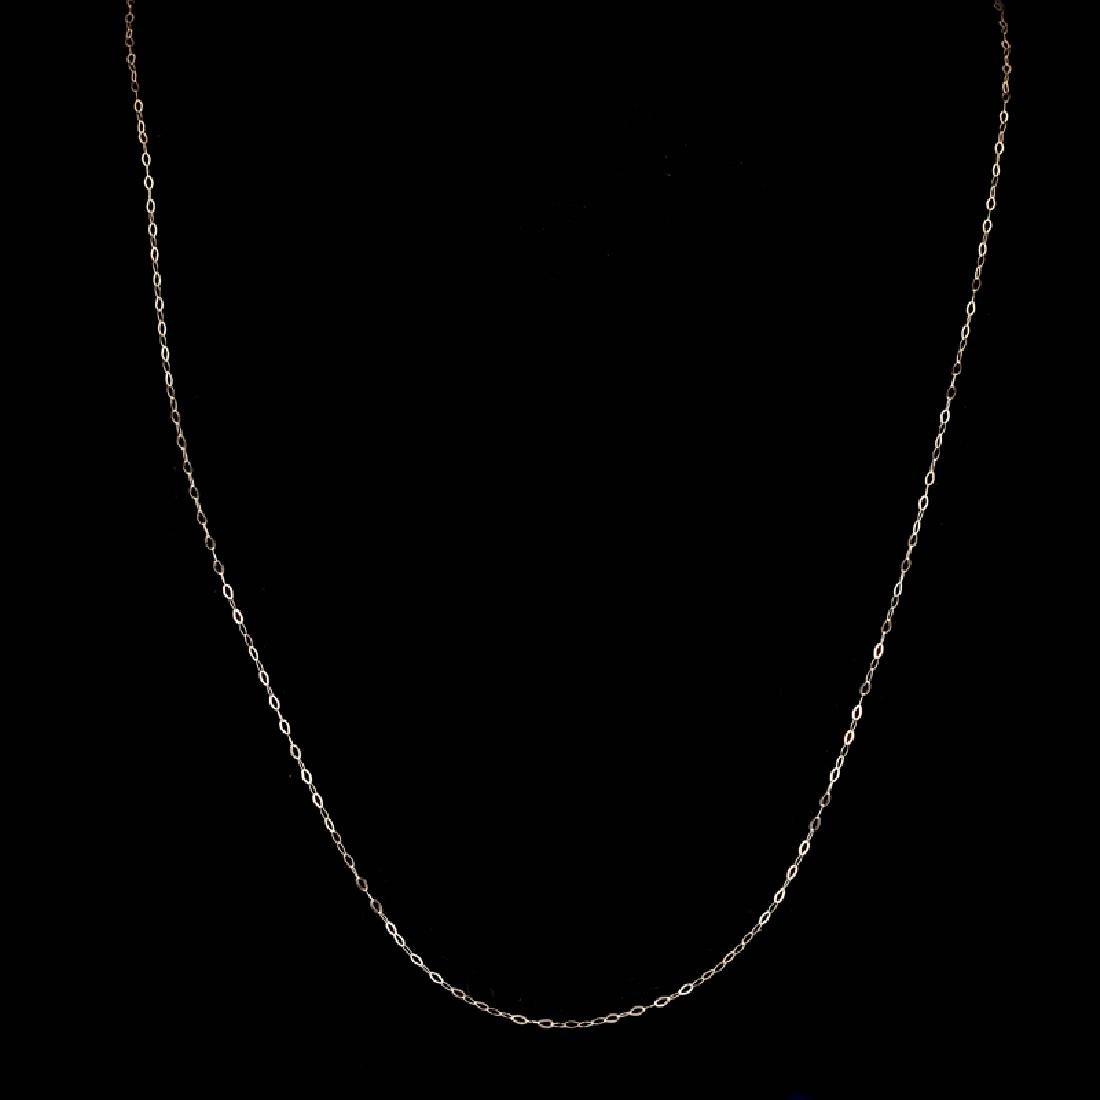 *Fine Jewelry 14KT Gold, 18'' Diamond Cut Link Chain